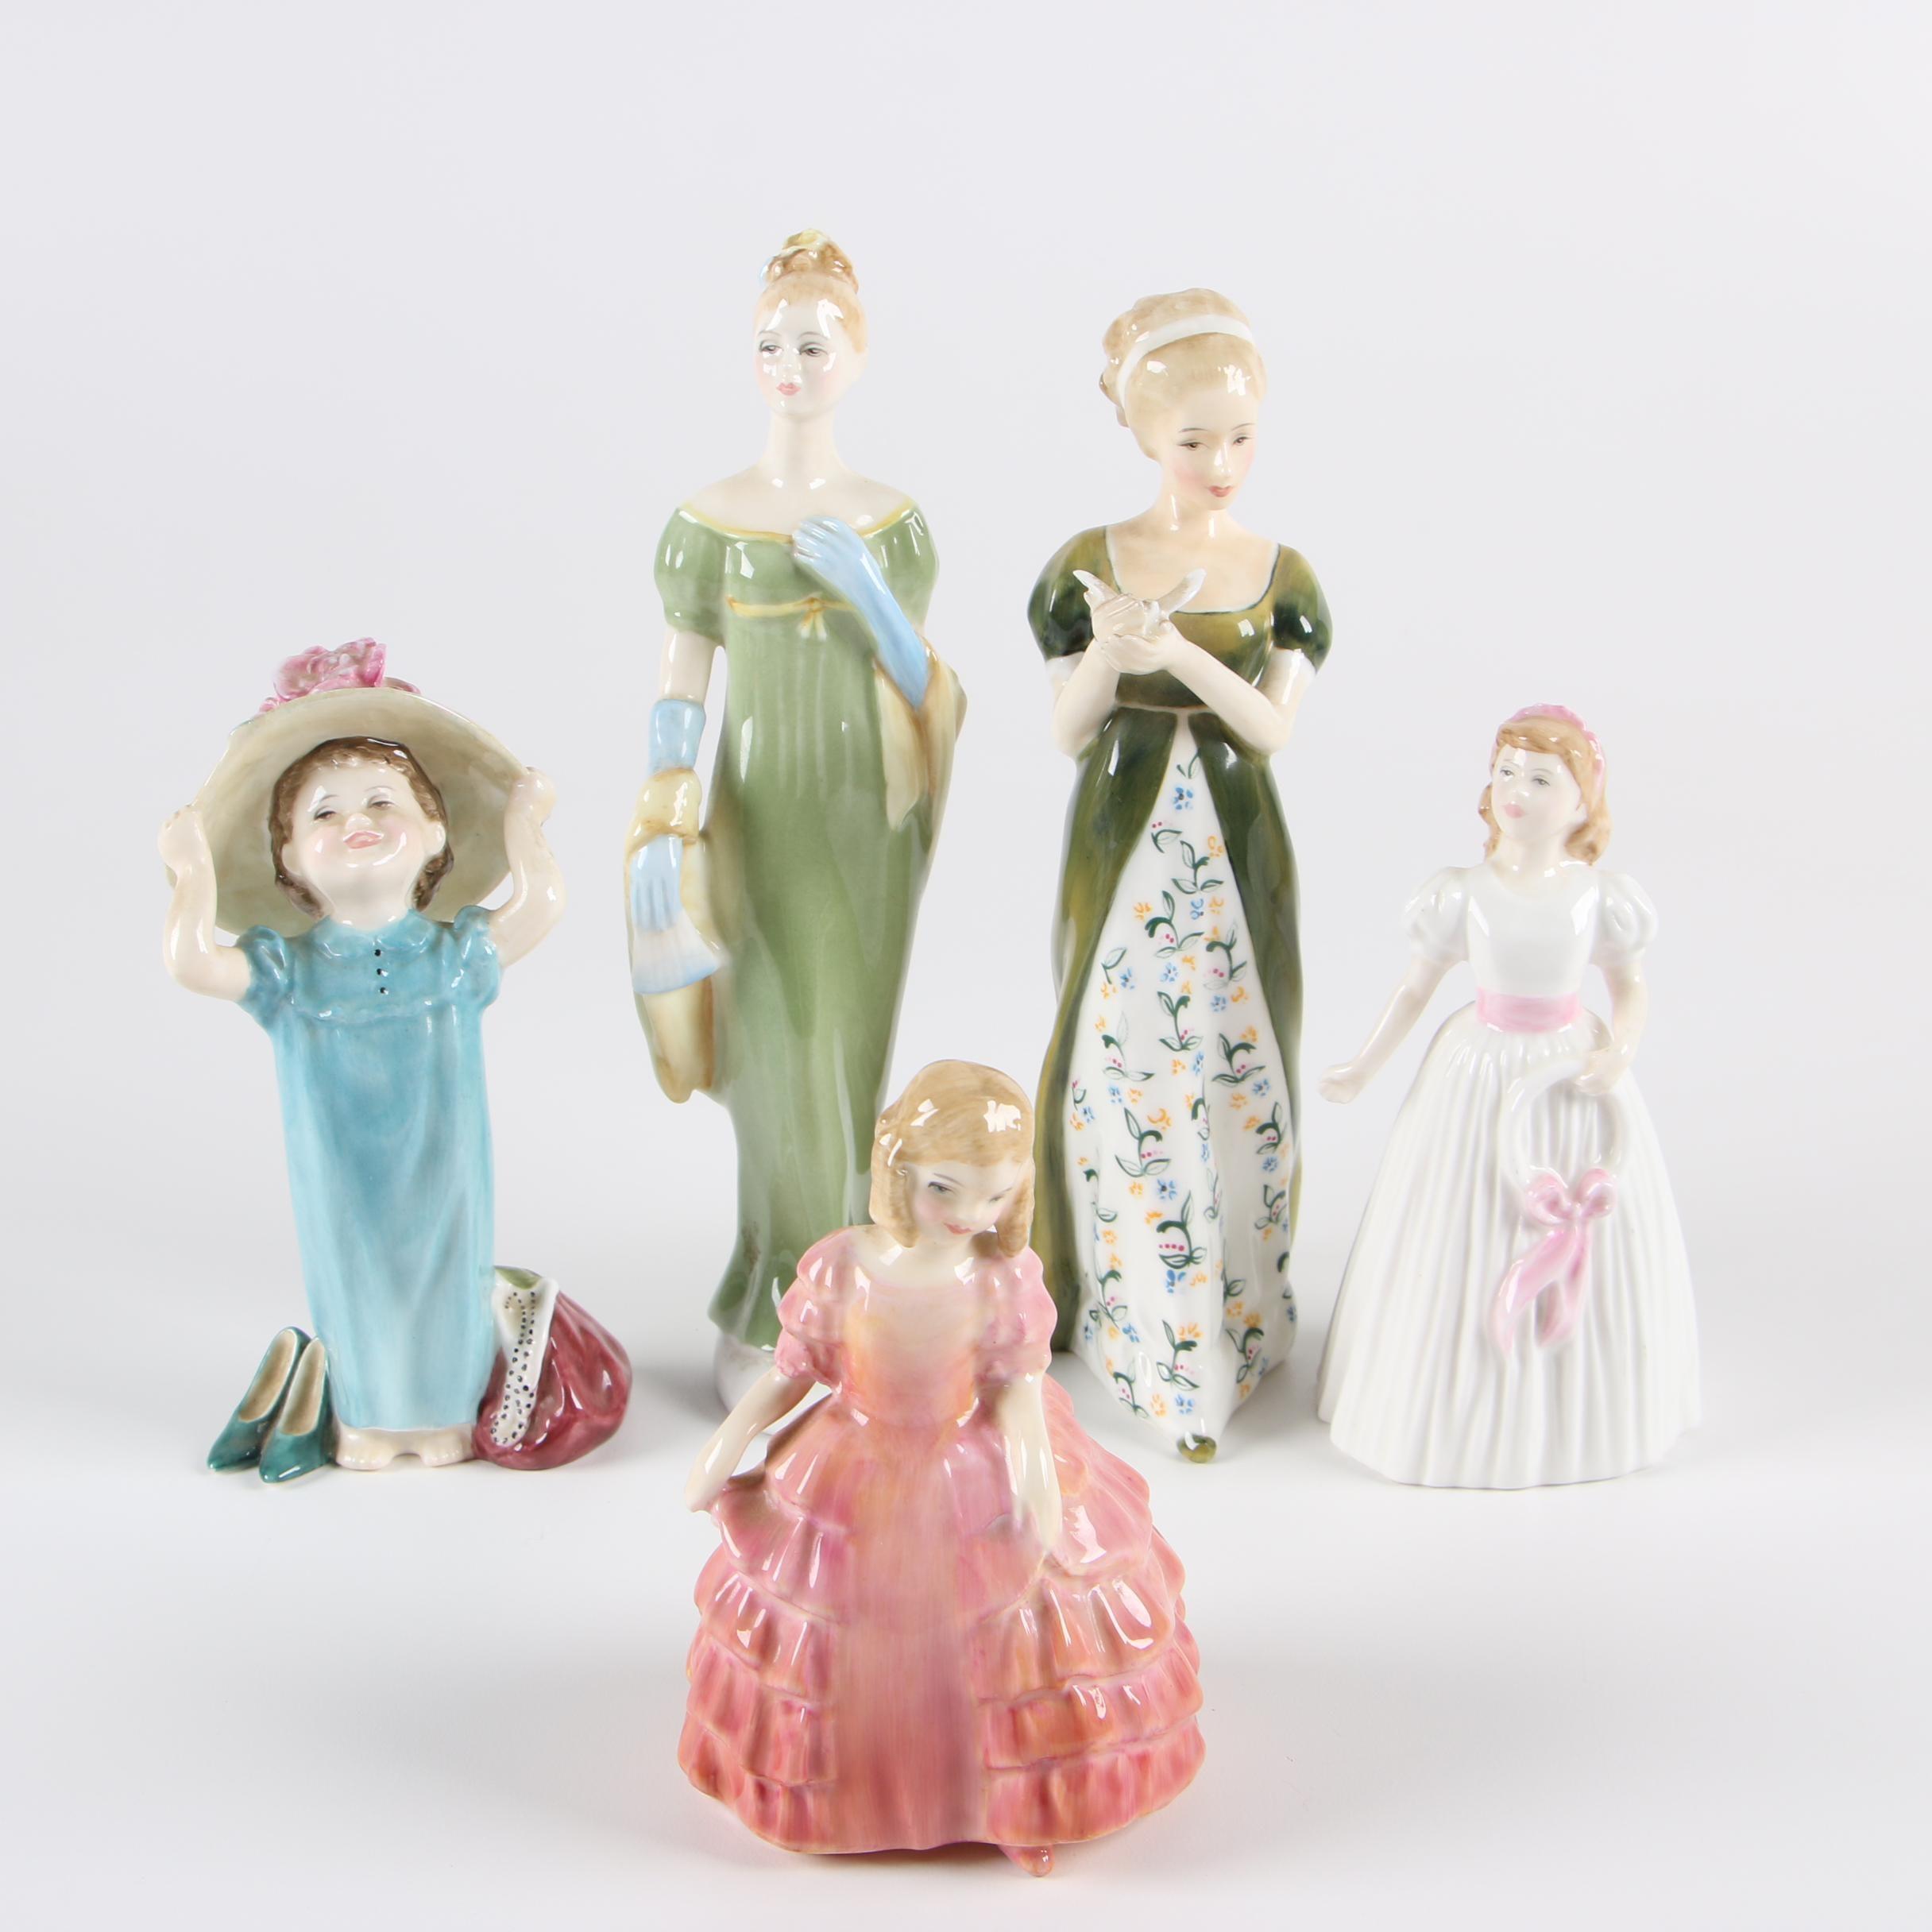 Royal Doulton Bone China Figurines